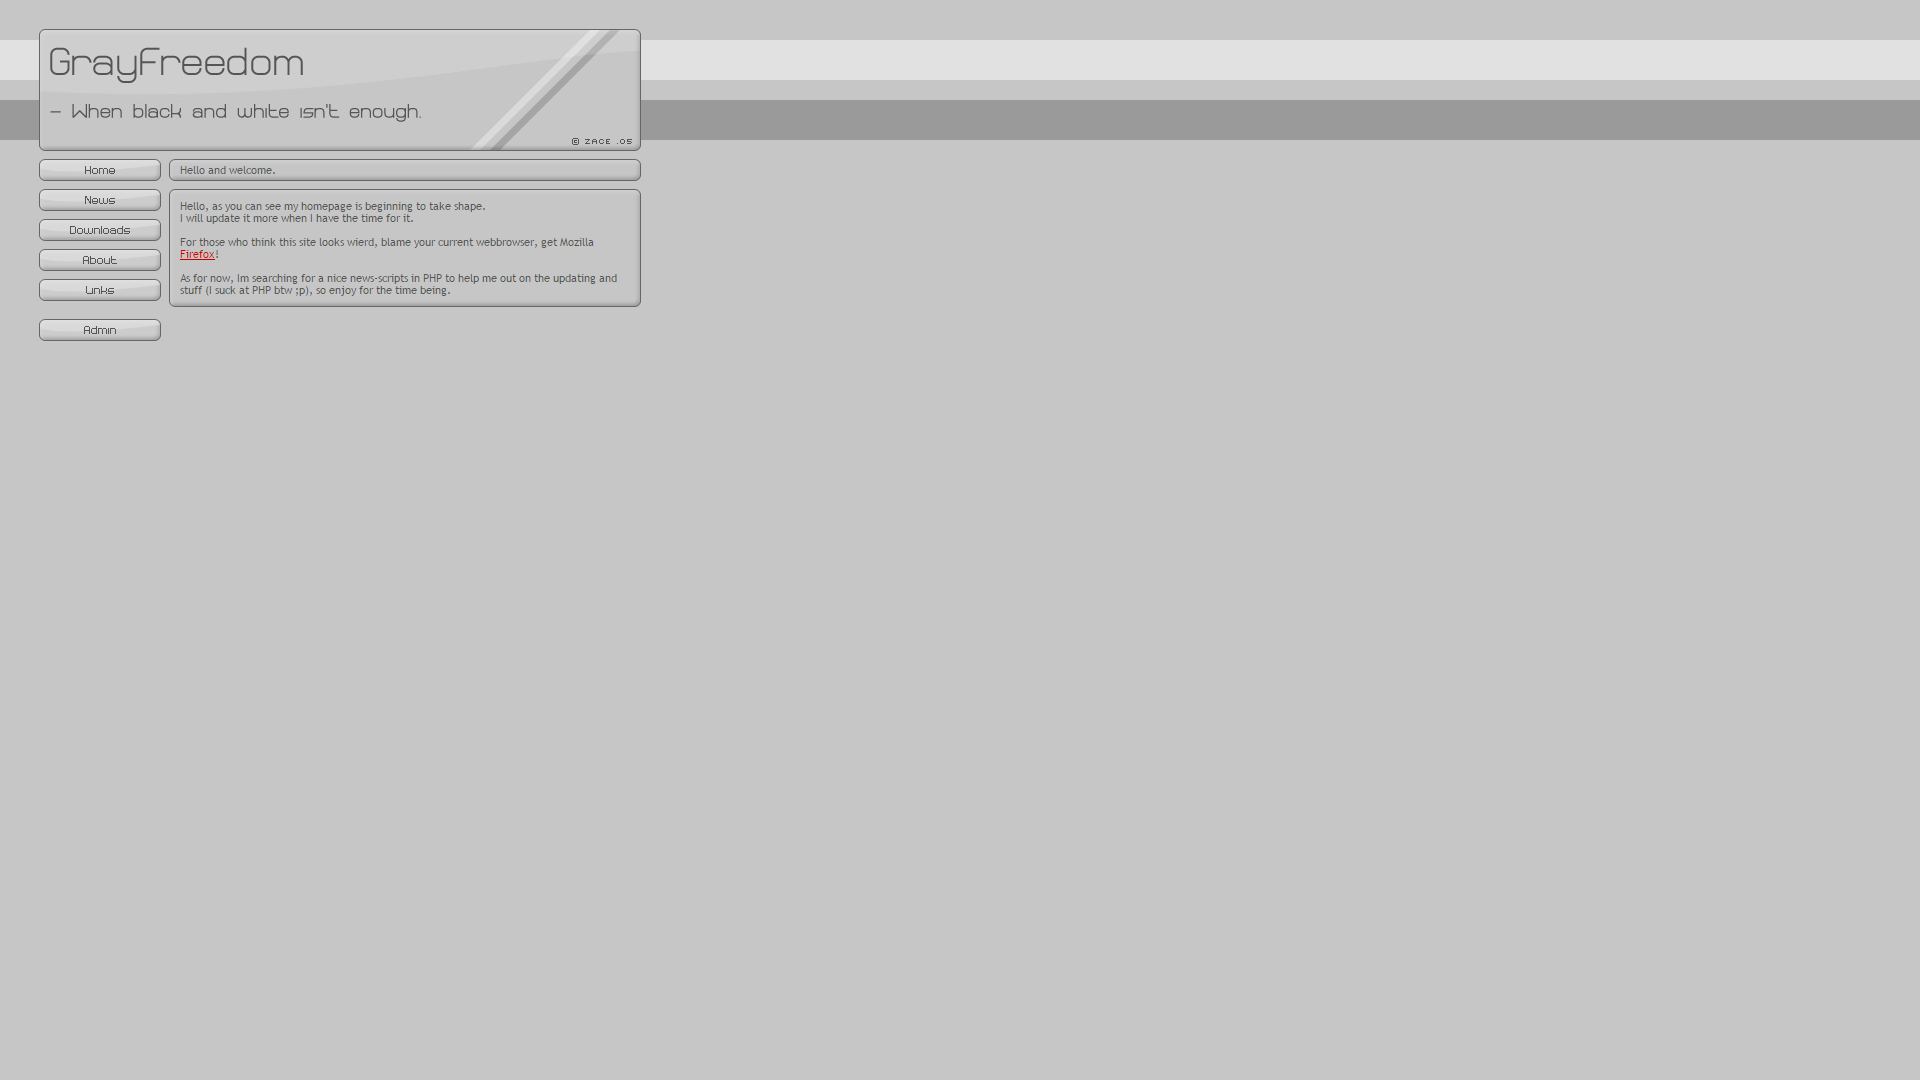 grayfreedom/assets/images/screenshot.png